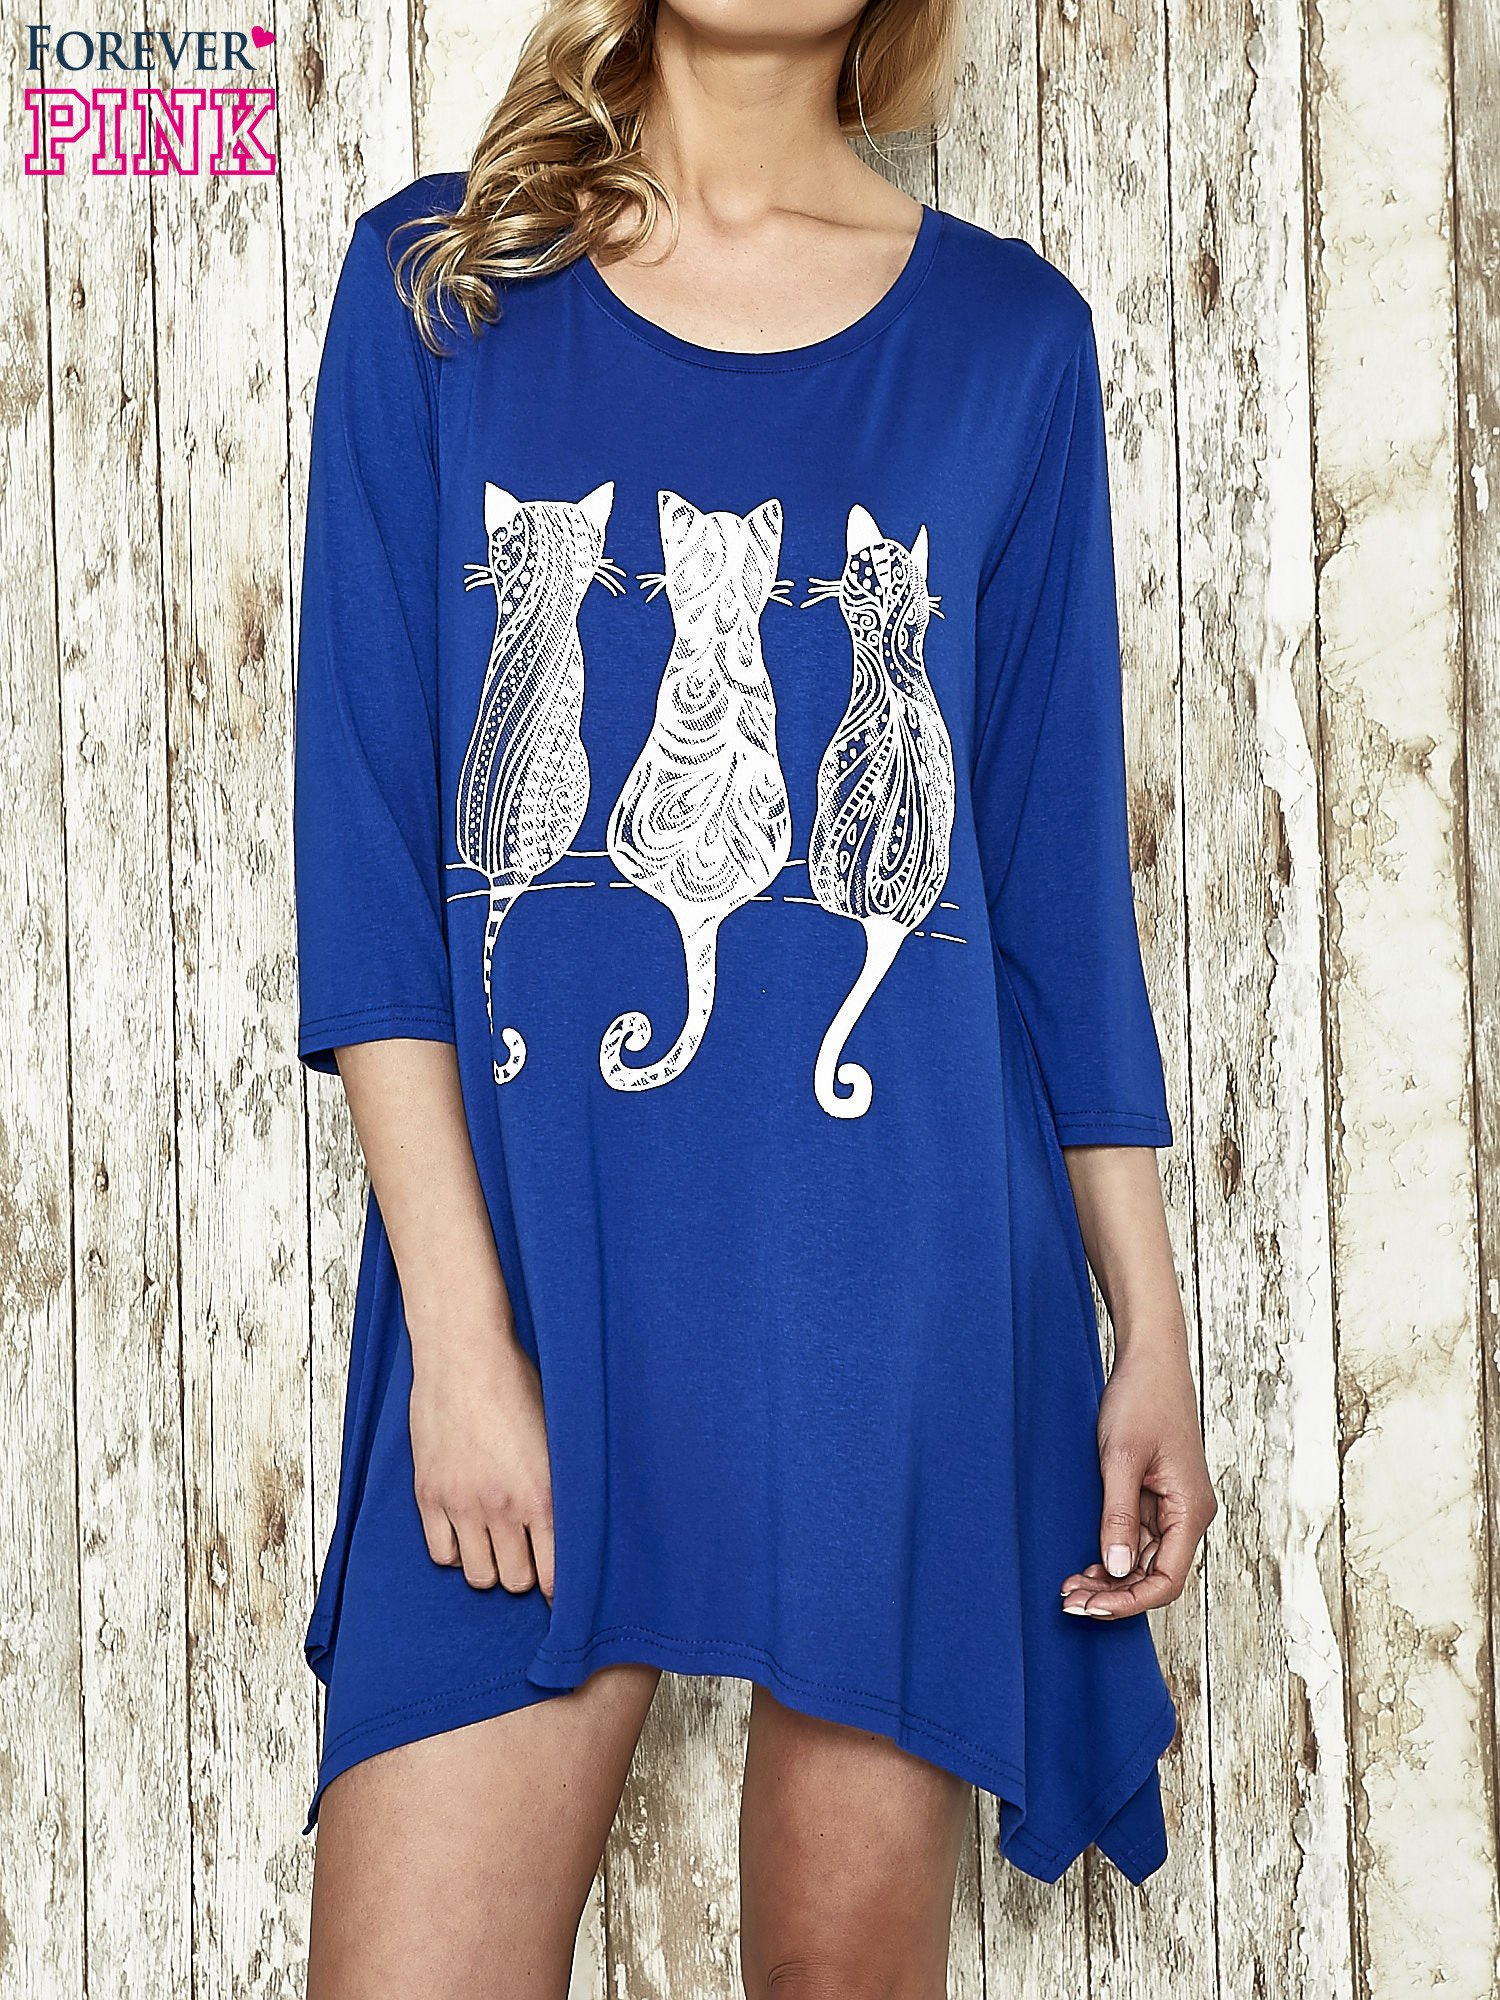 Ciemnoniebieska sukienka damska z nadrukiem kotów                                  zdj.                                  1